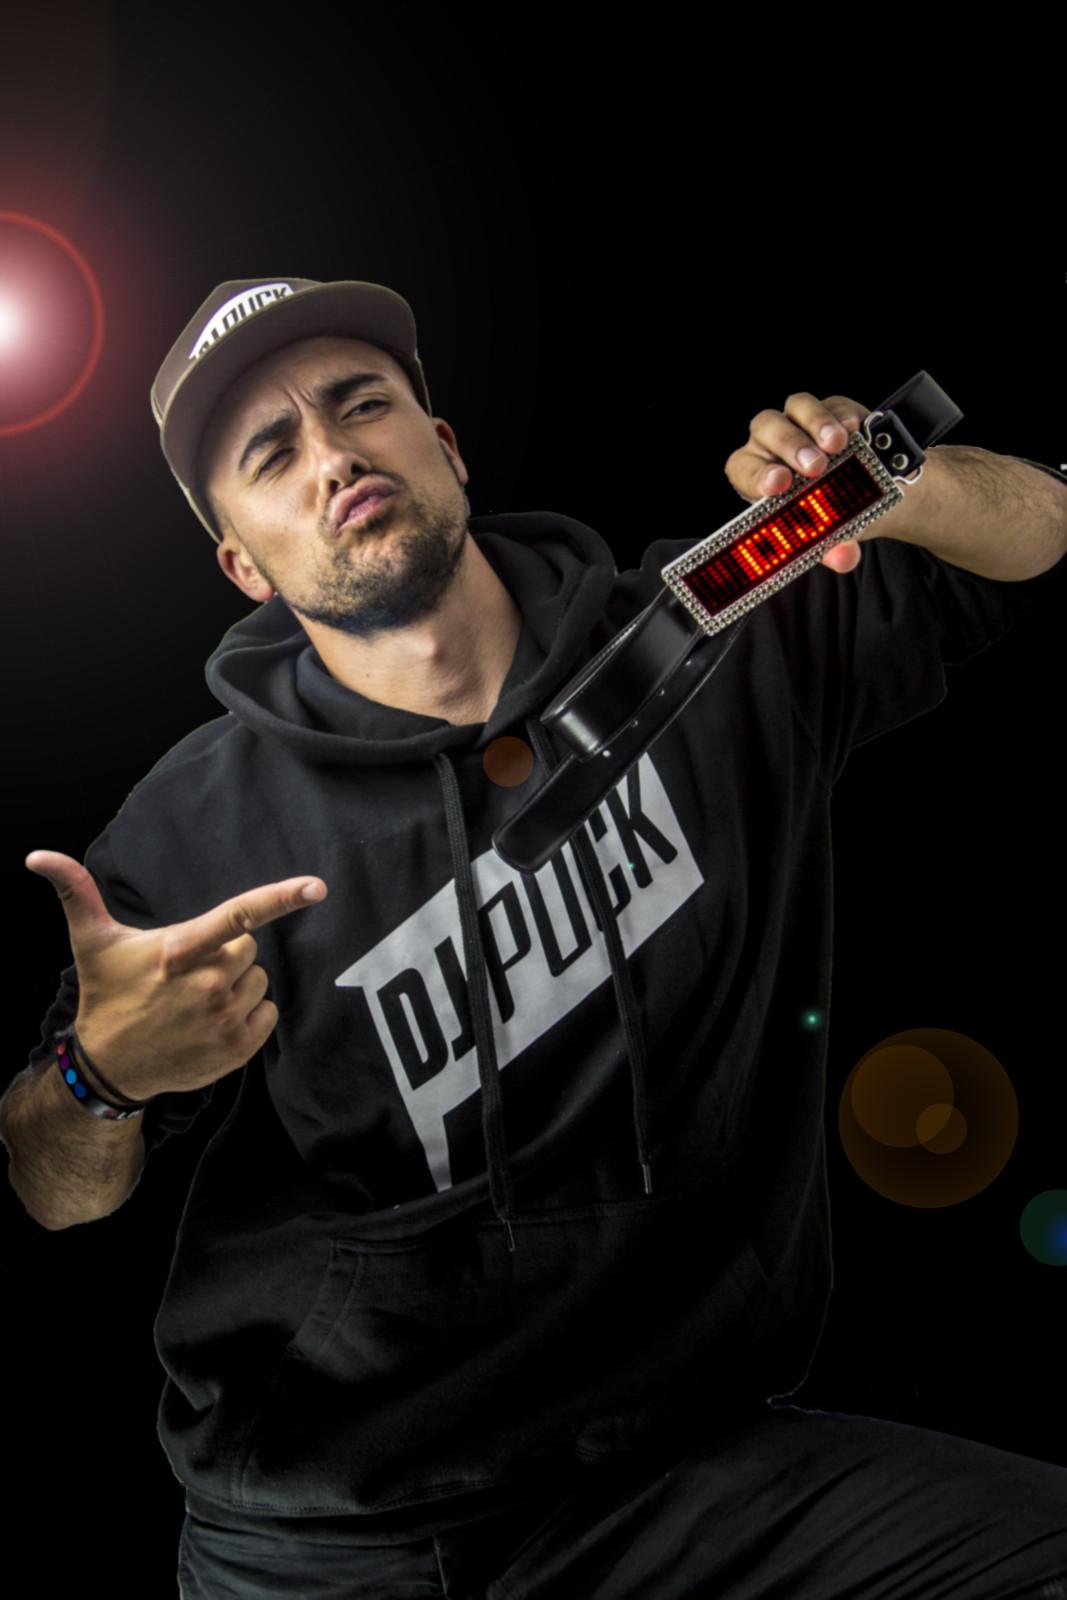 DJPUCK3